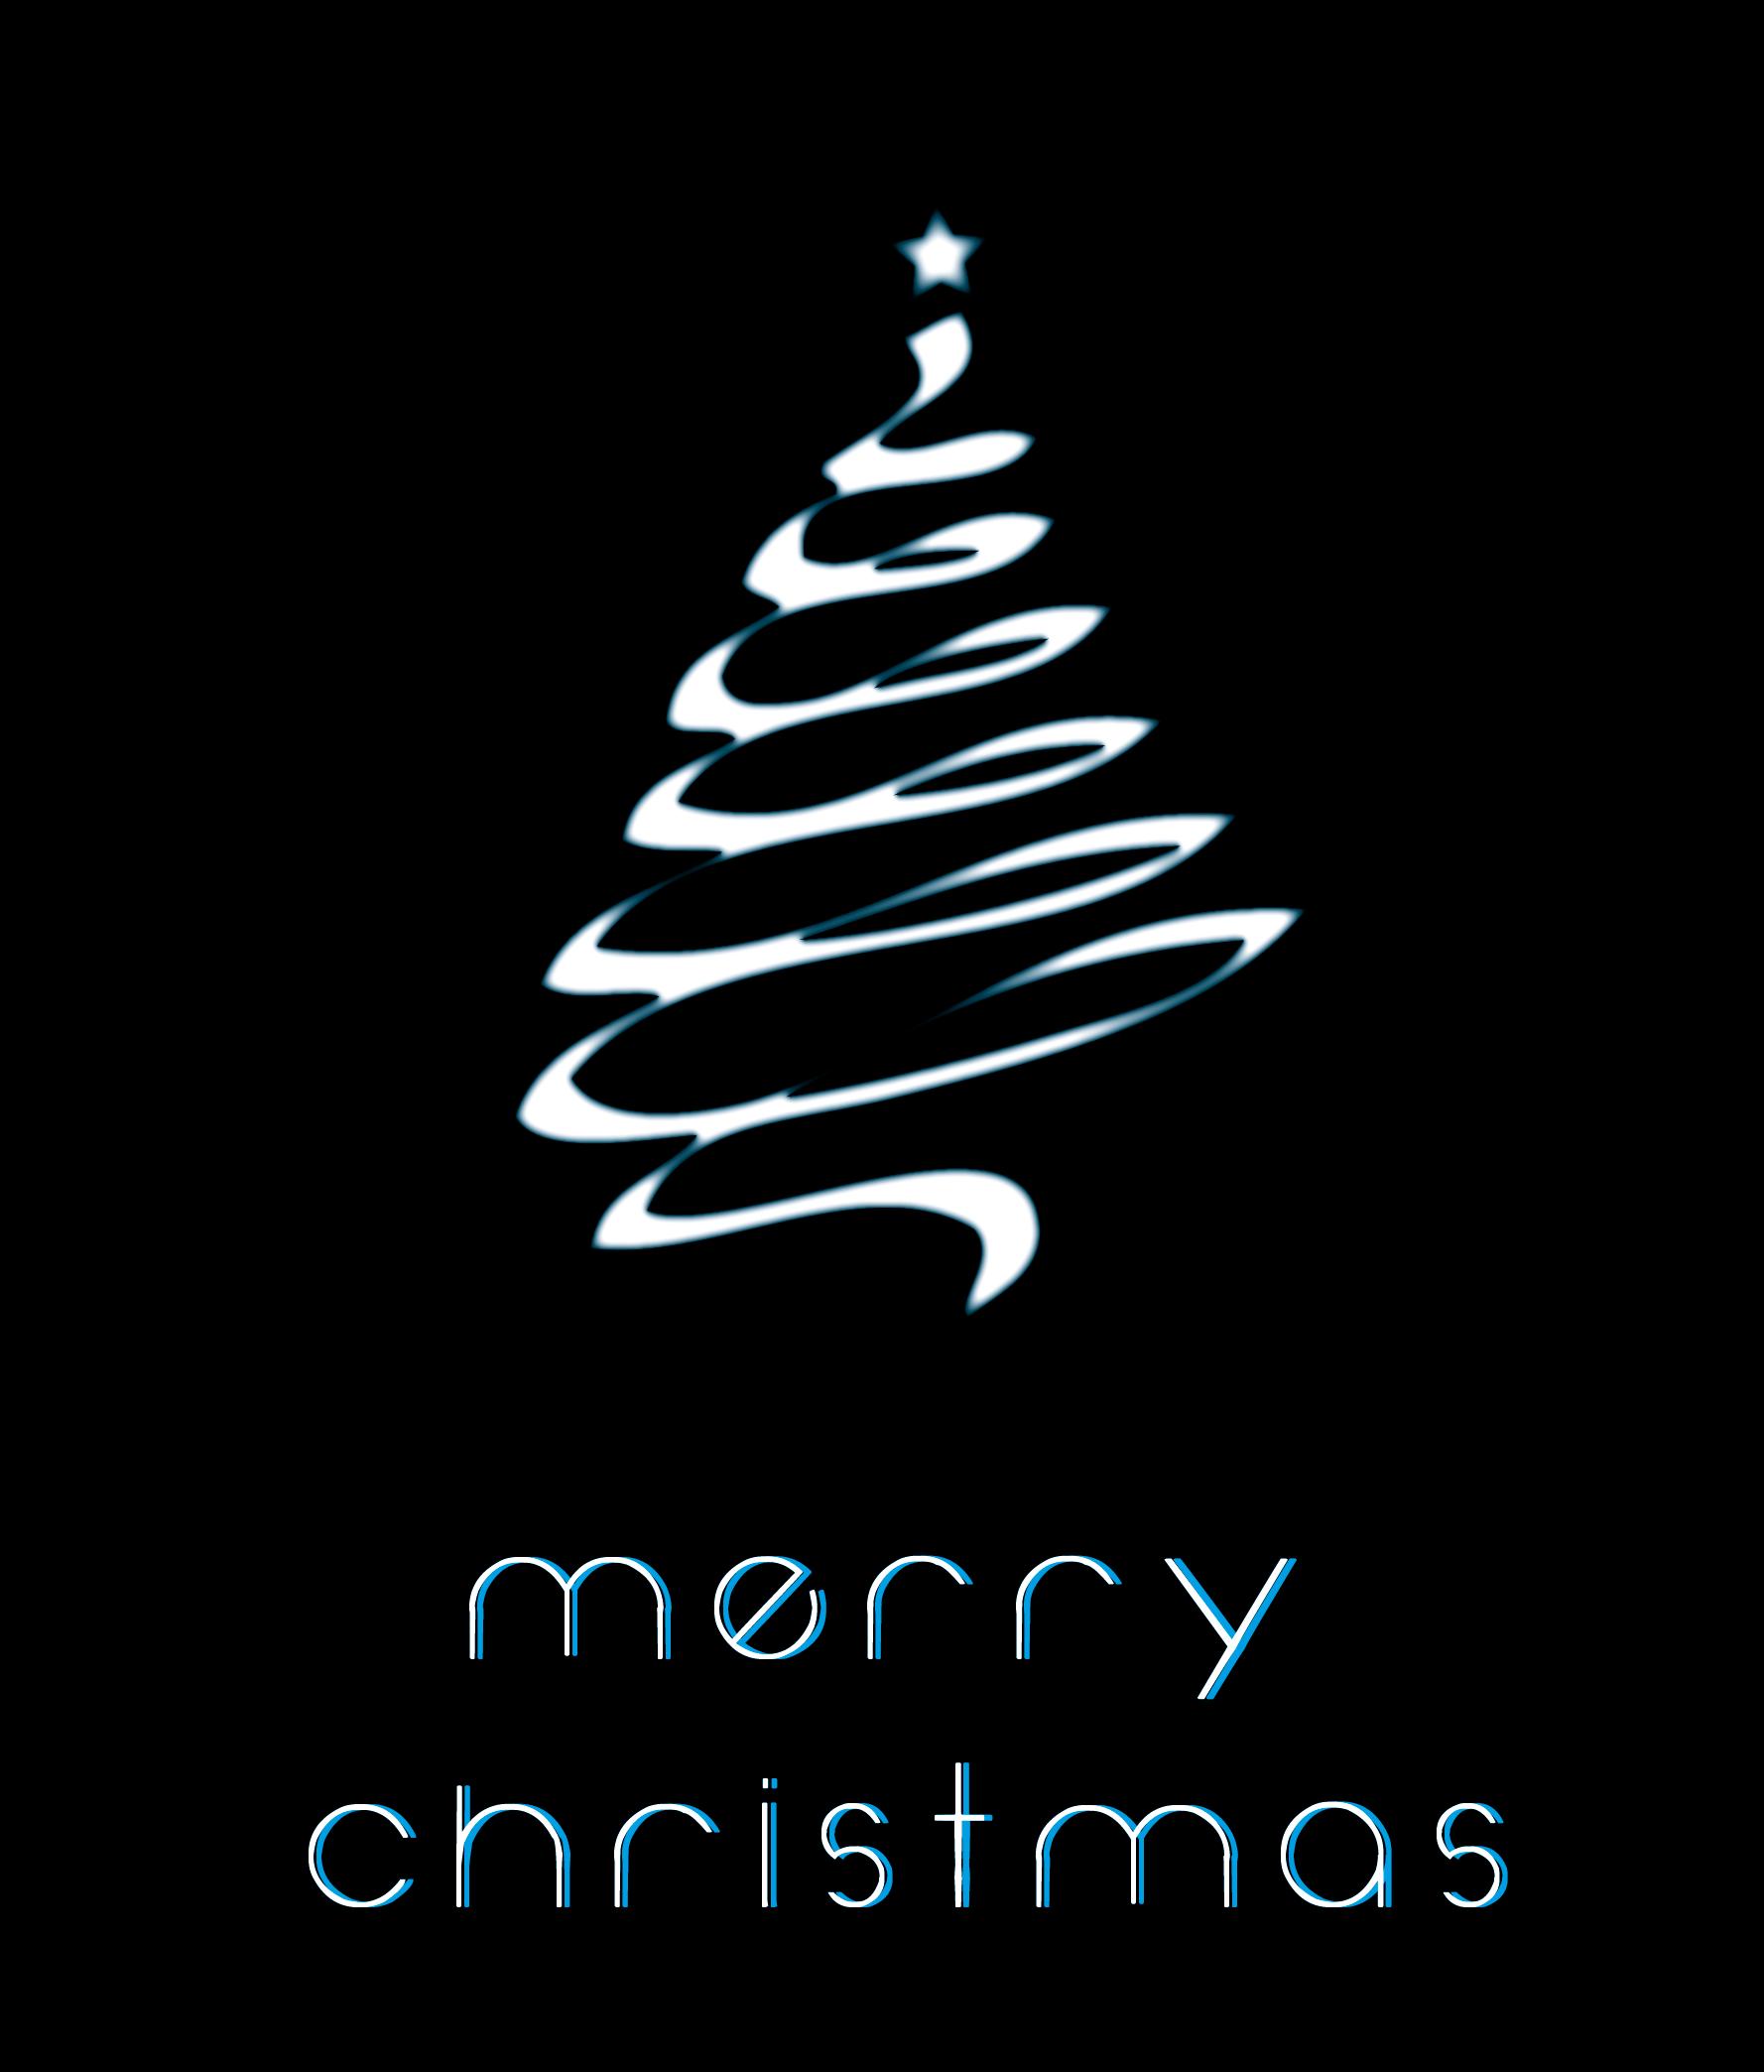 Christmas Card Design 2 Christmas Tree By Rgunx On Deviantart